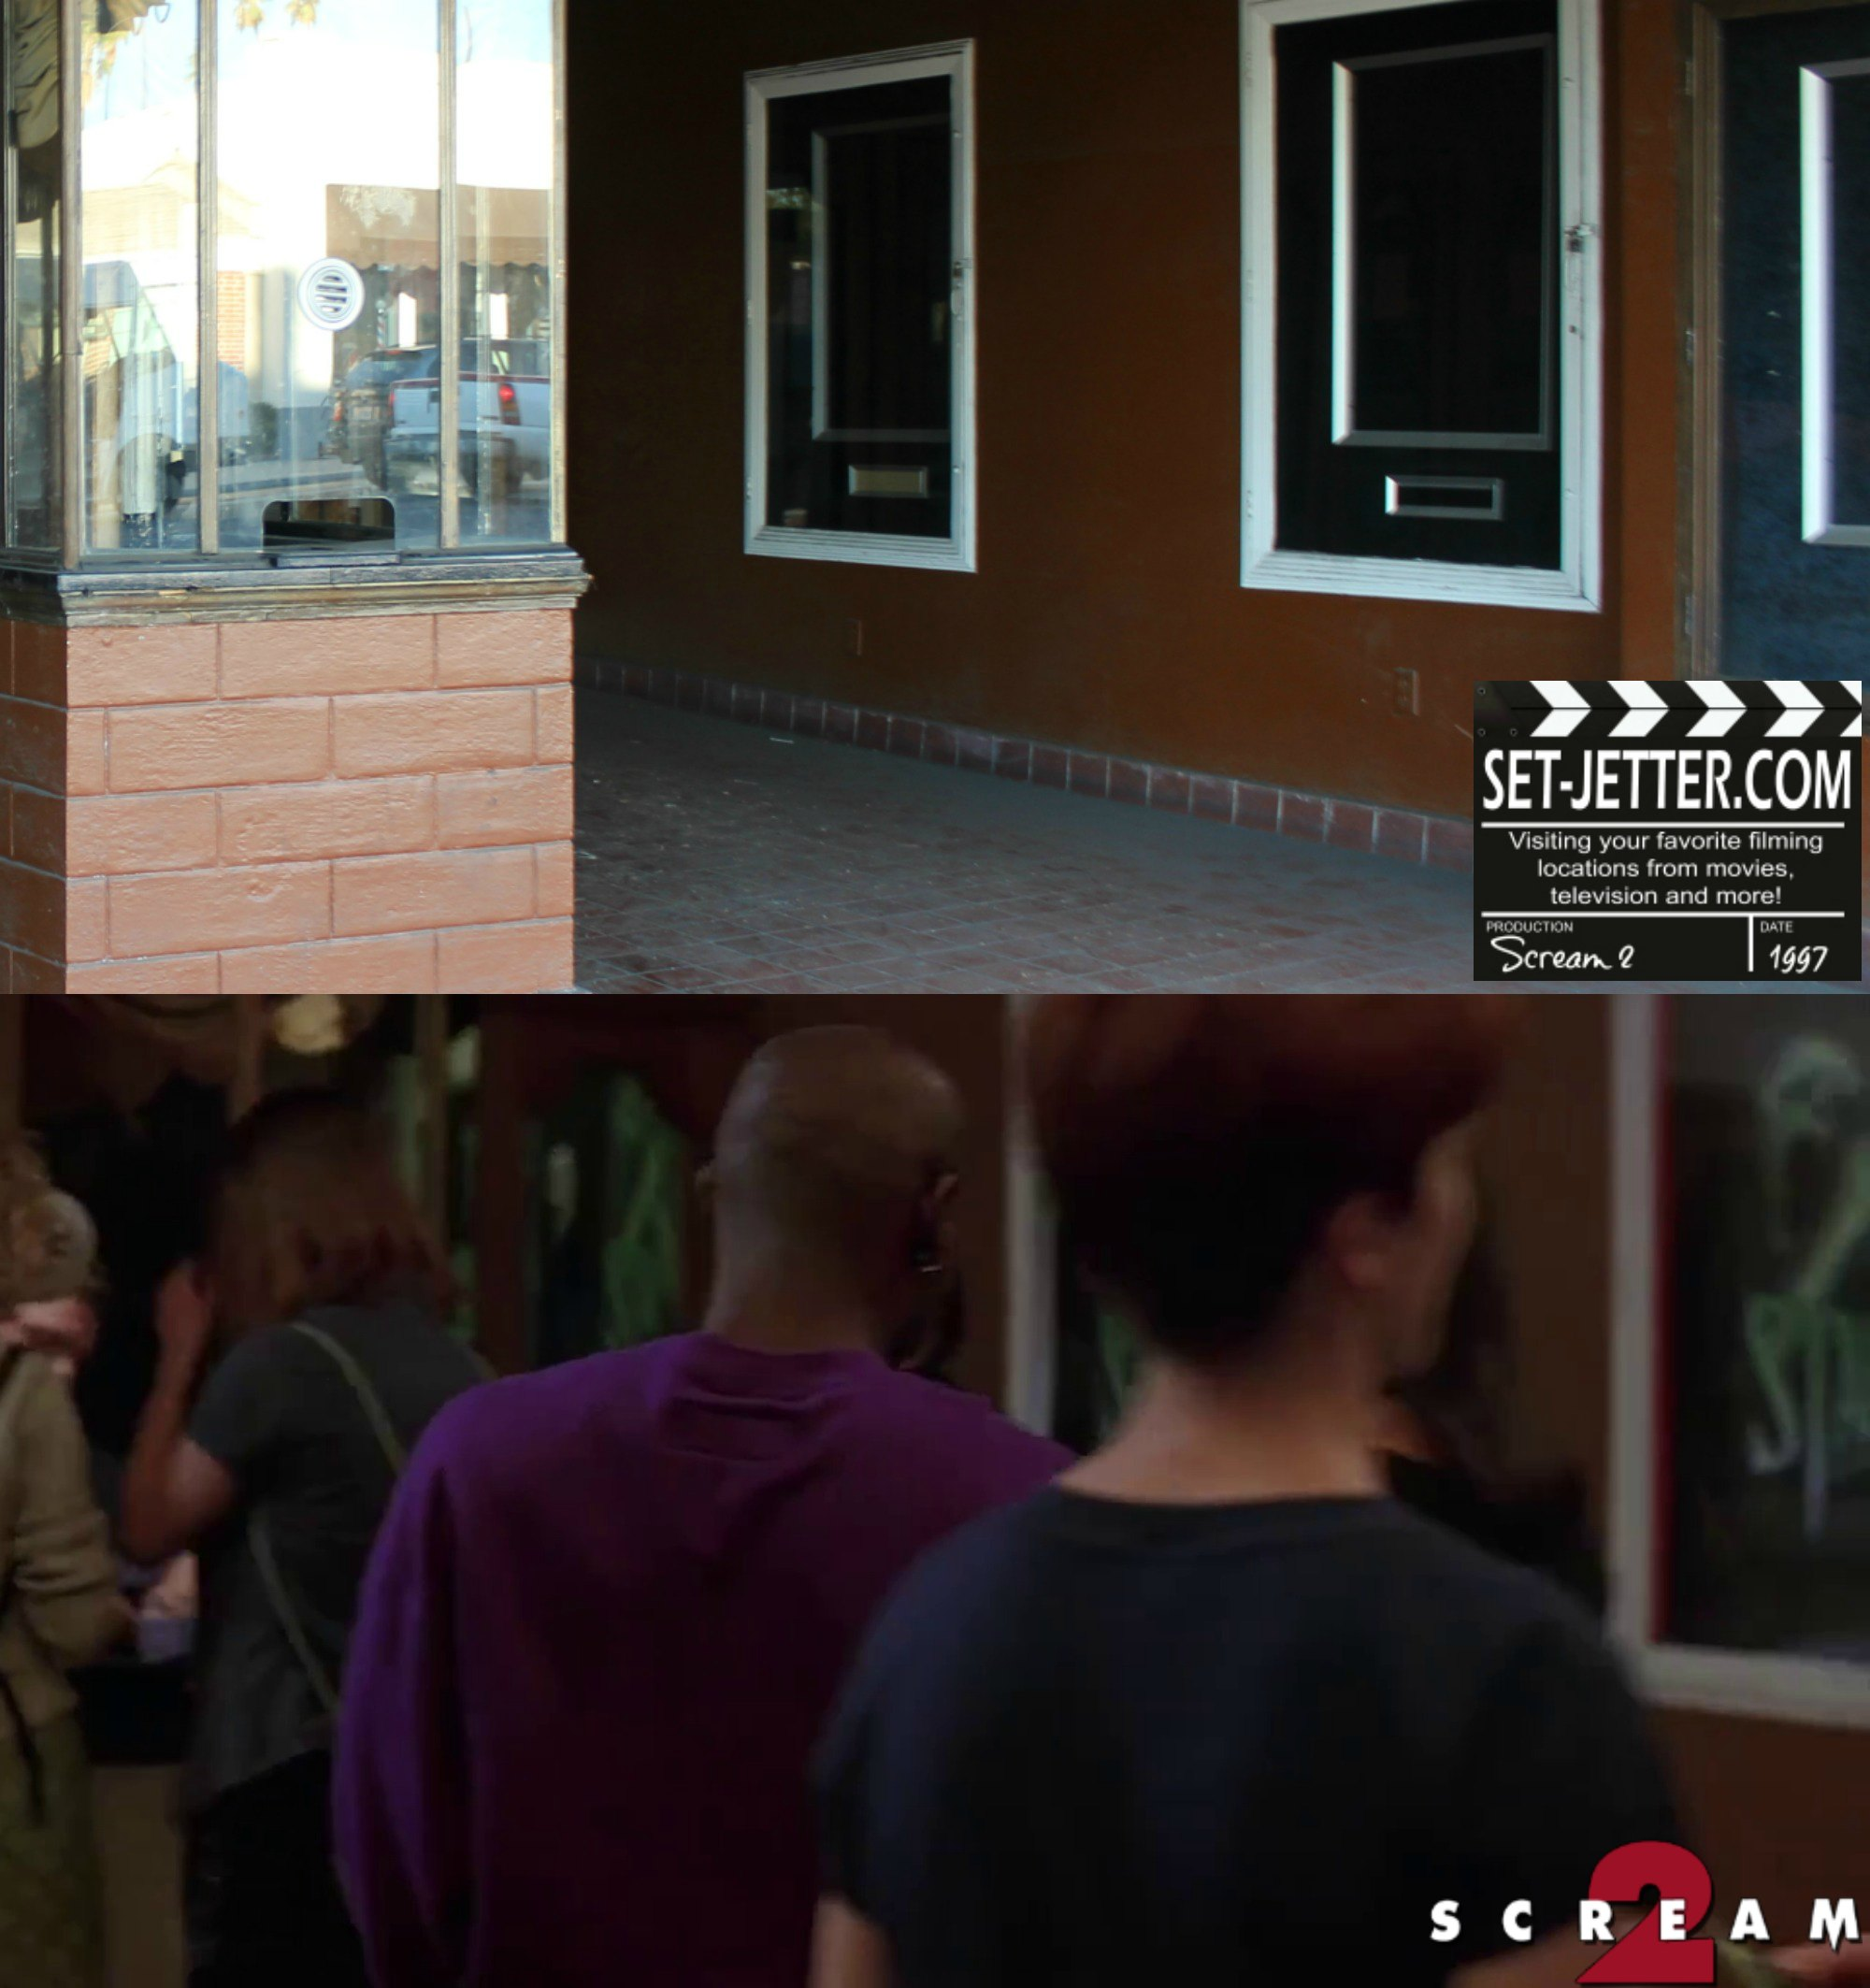 Scream 2 comparison 07.jpg